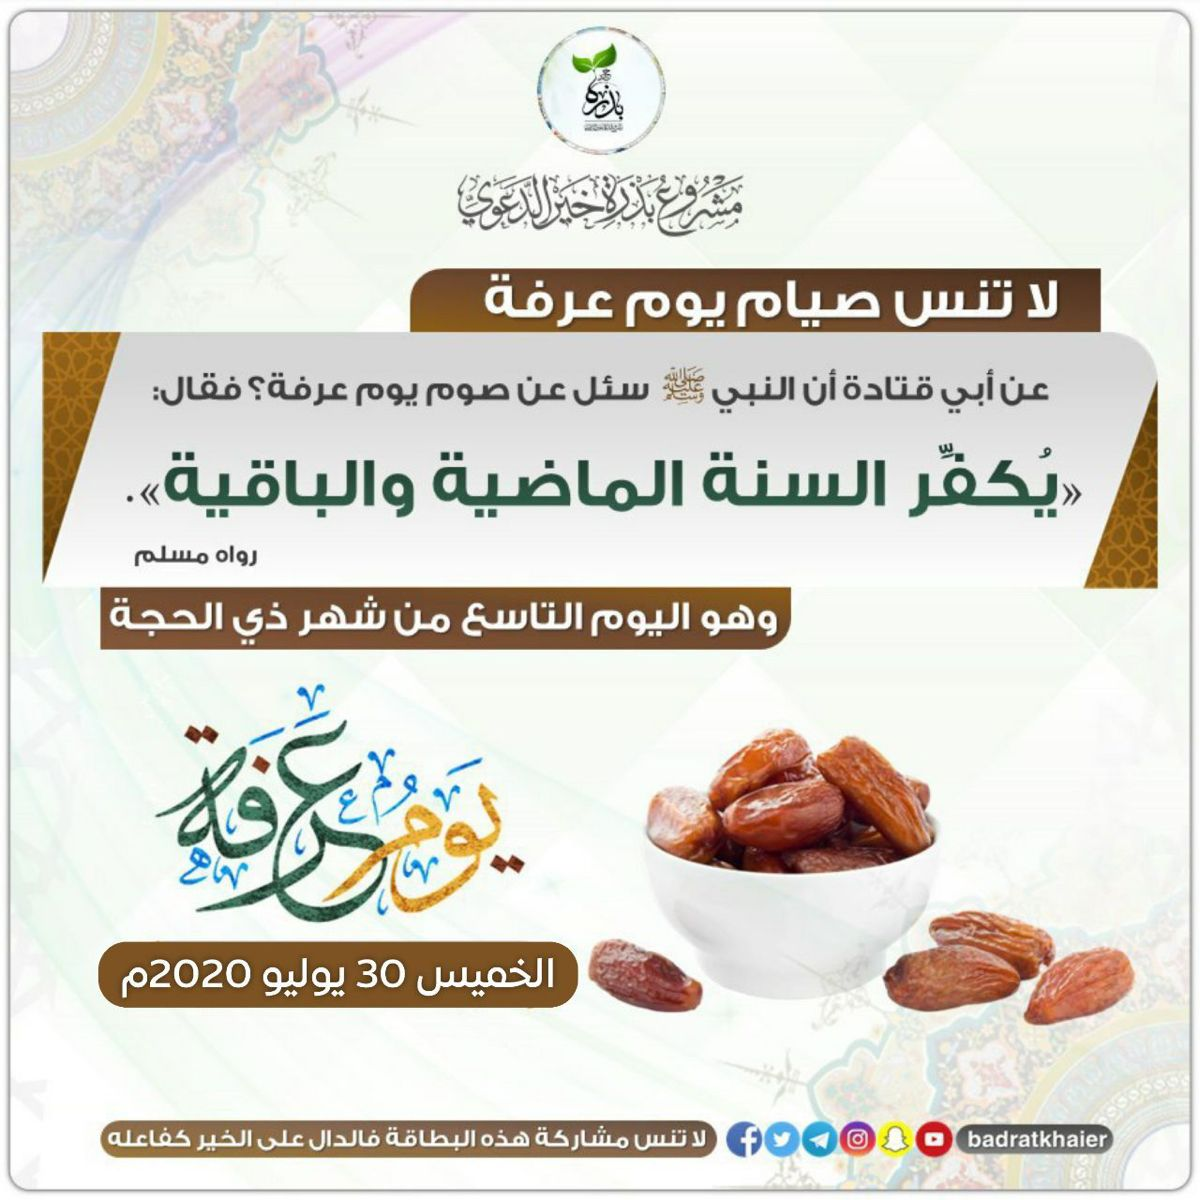 Pin By اترك اثرأ قبل الرحيل On الحج وعيد الاضحى Islam Facts Ahadith 10 Things